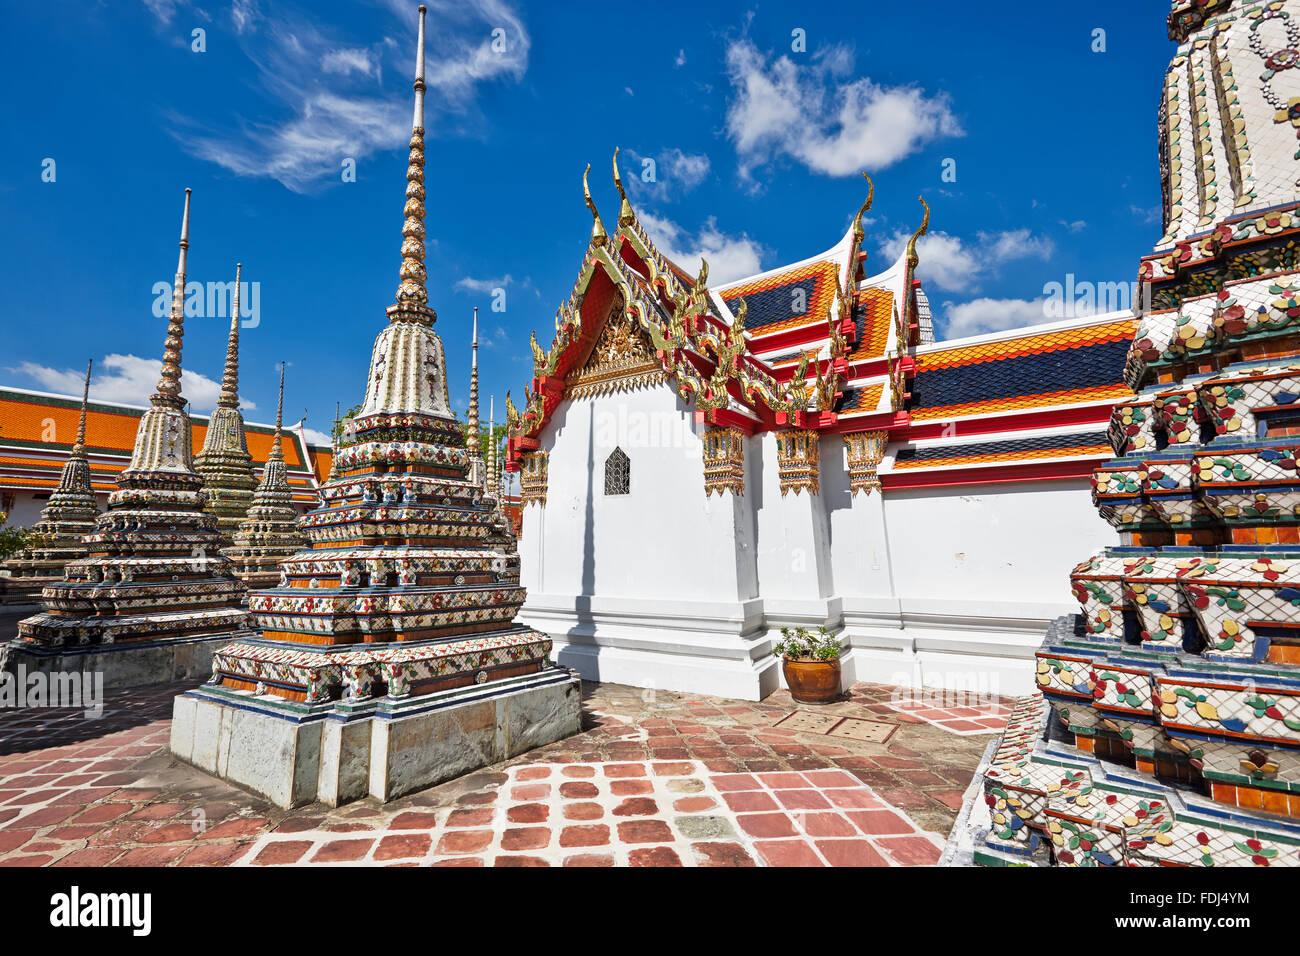 Pagodas del templo de Wat Pho, Bangkok, Tailandia. Imagen De Stock